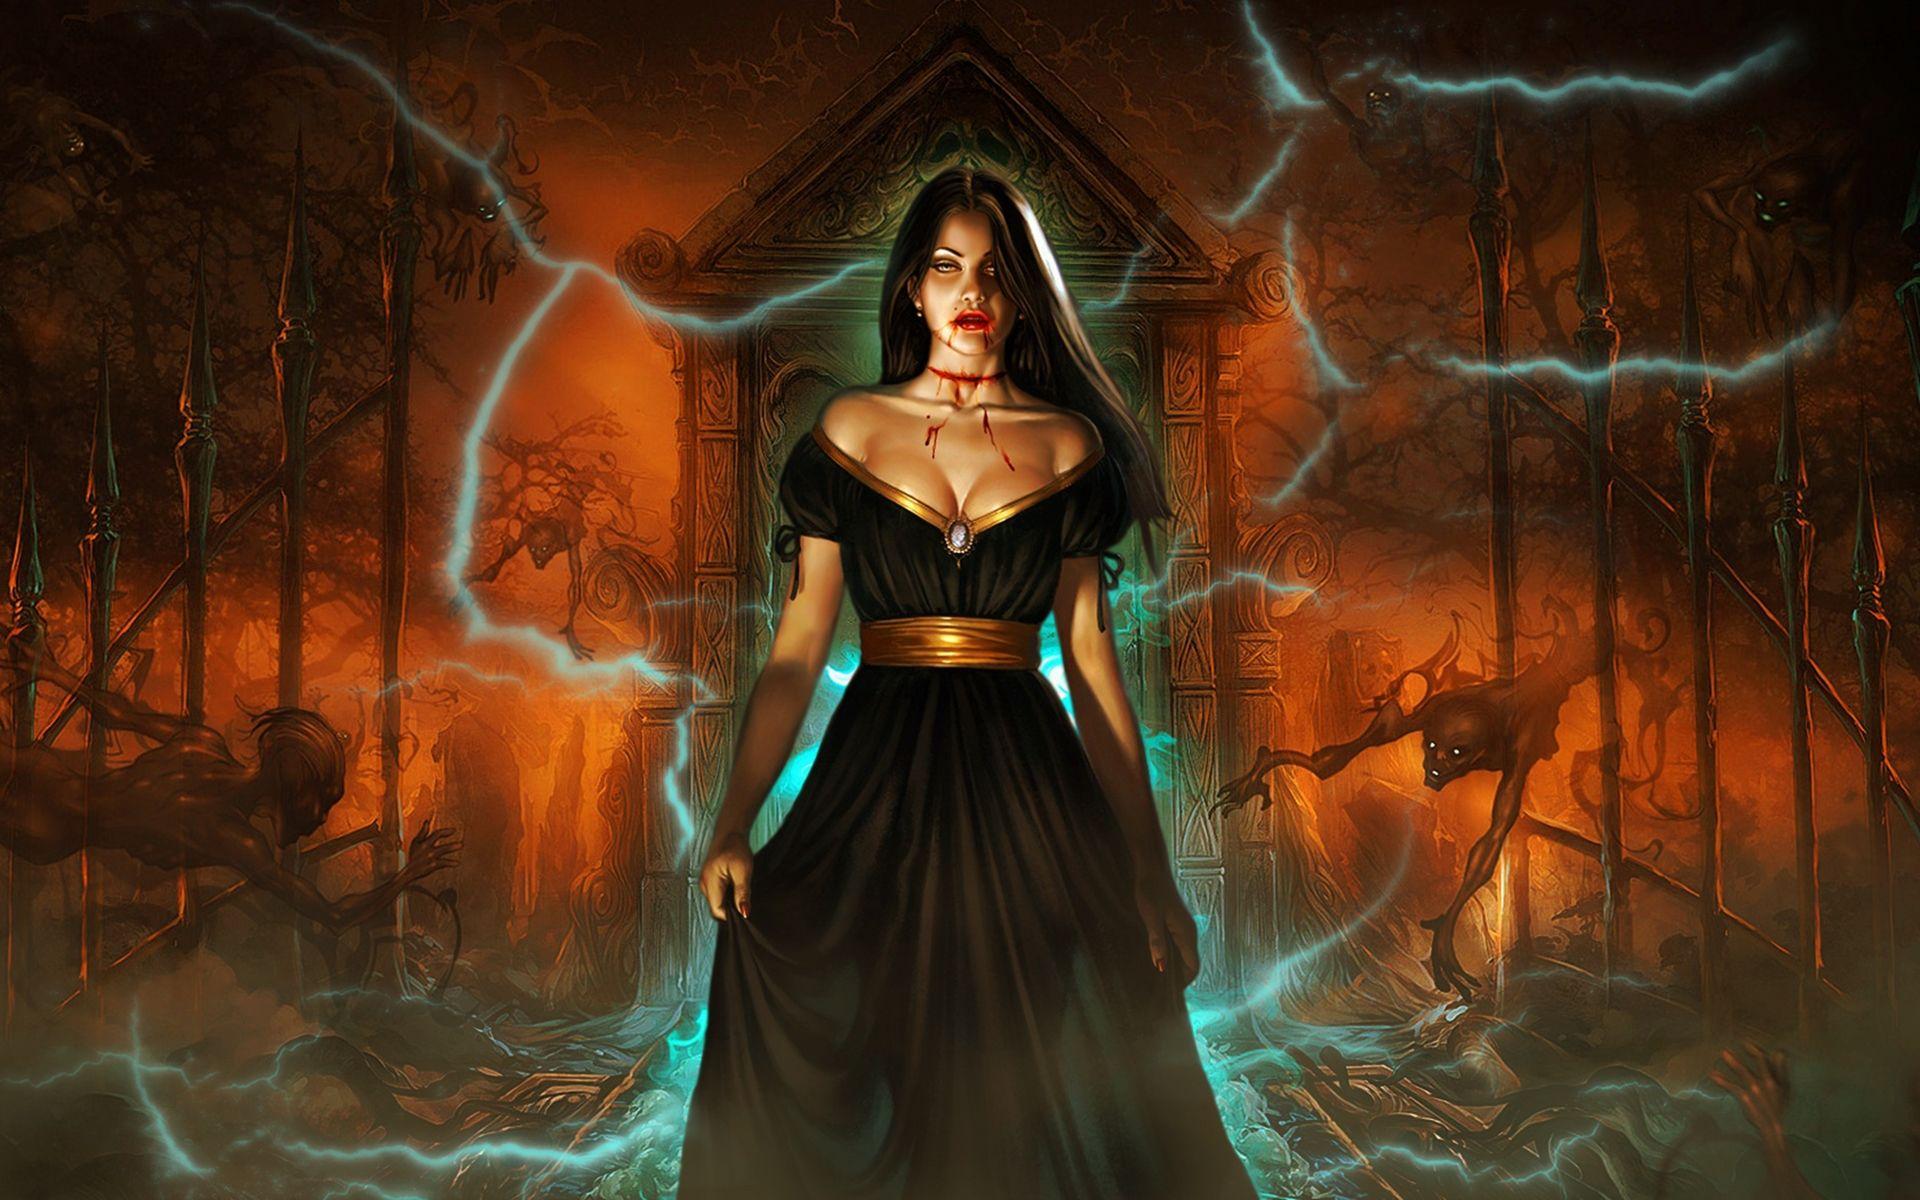 evil females vampires queen dark horror women fantasy